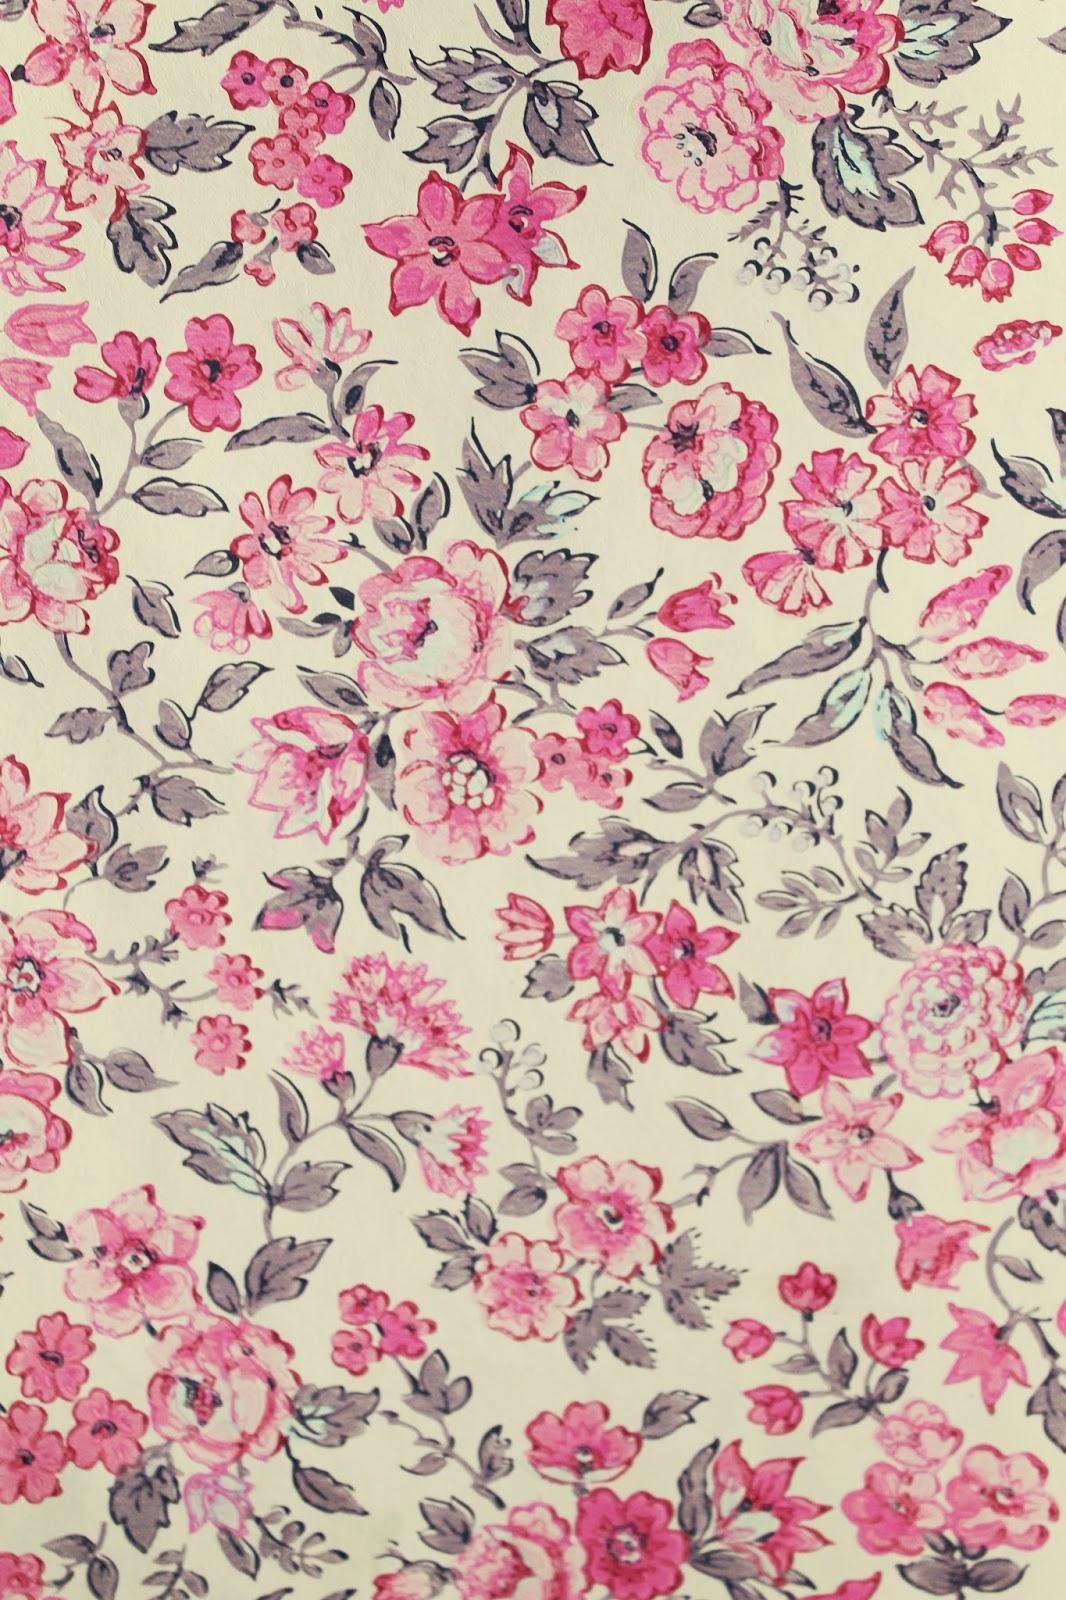 Vintage Flower Wallpaper Iphone 1066x1600 Wallpaper Teahub Io